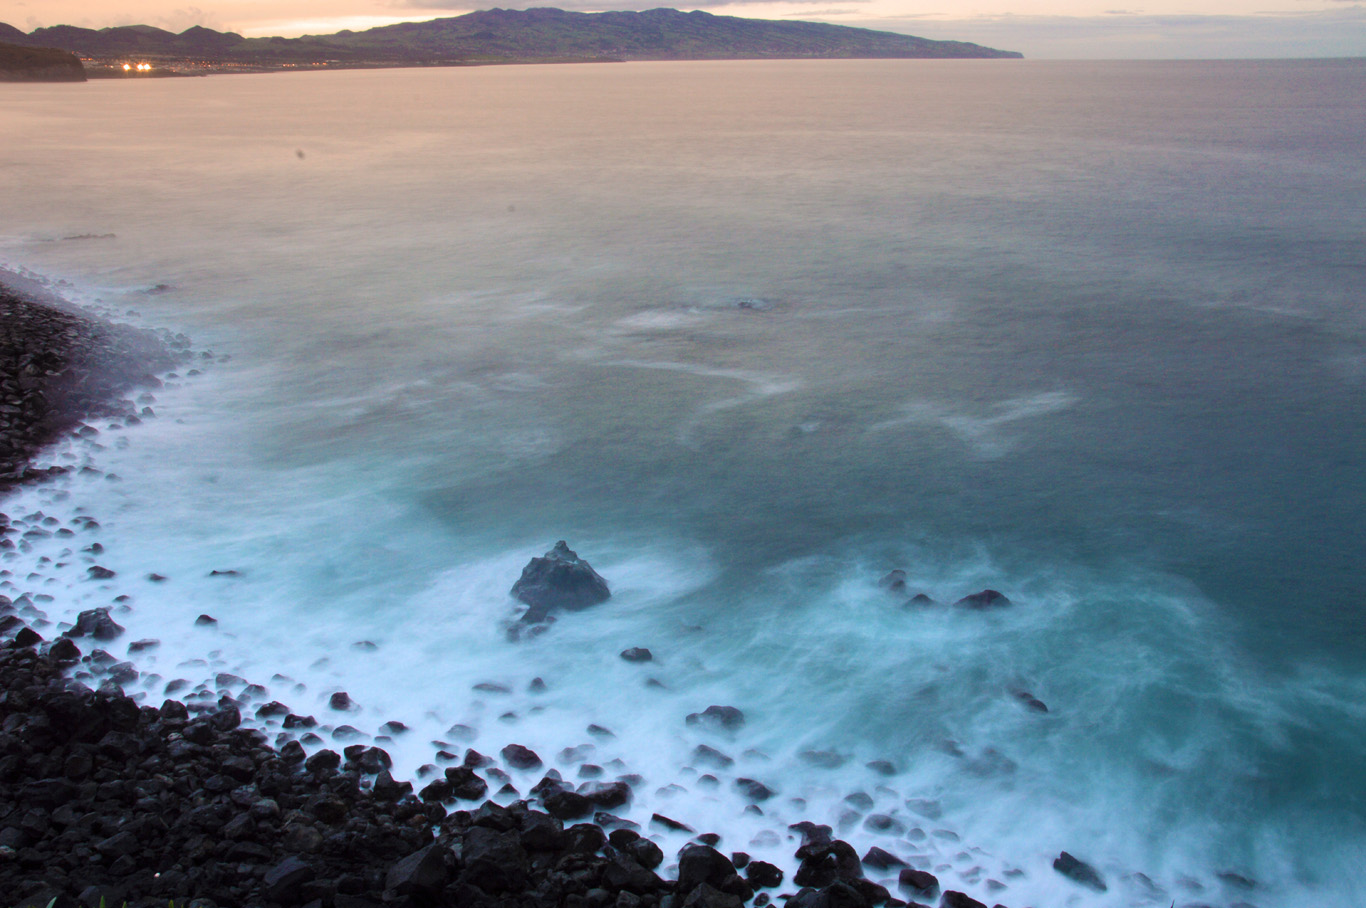 Black volcanic beach at Ribeira Grande